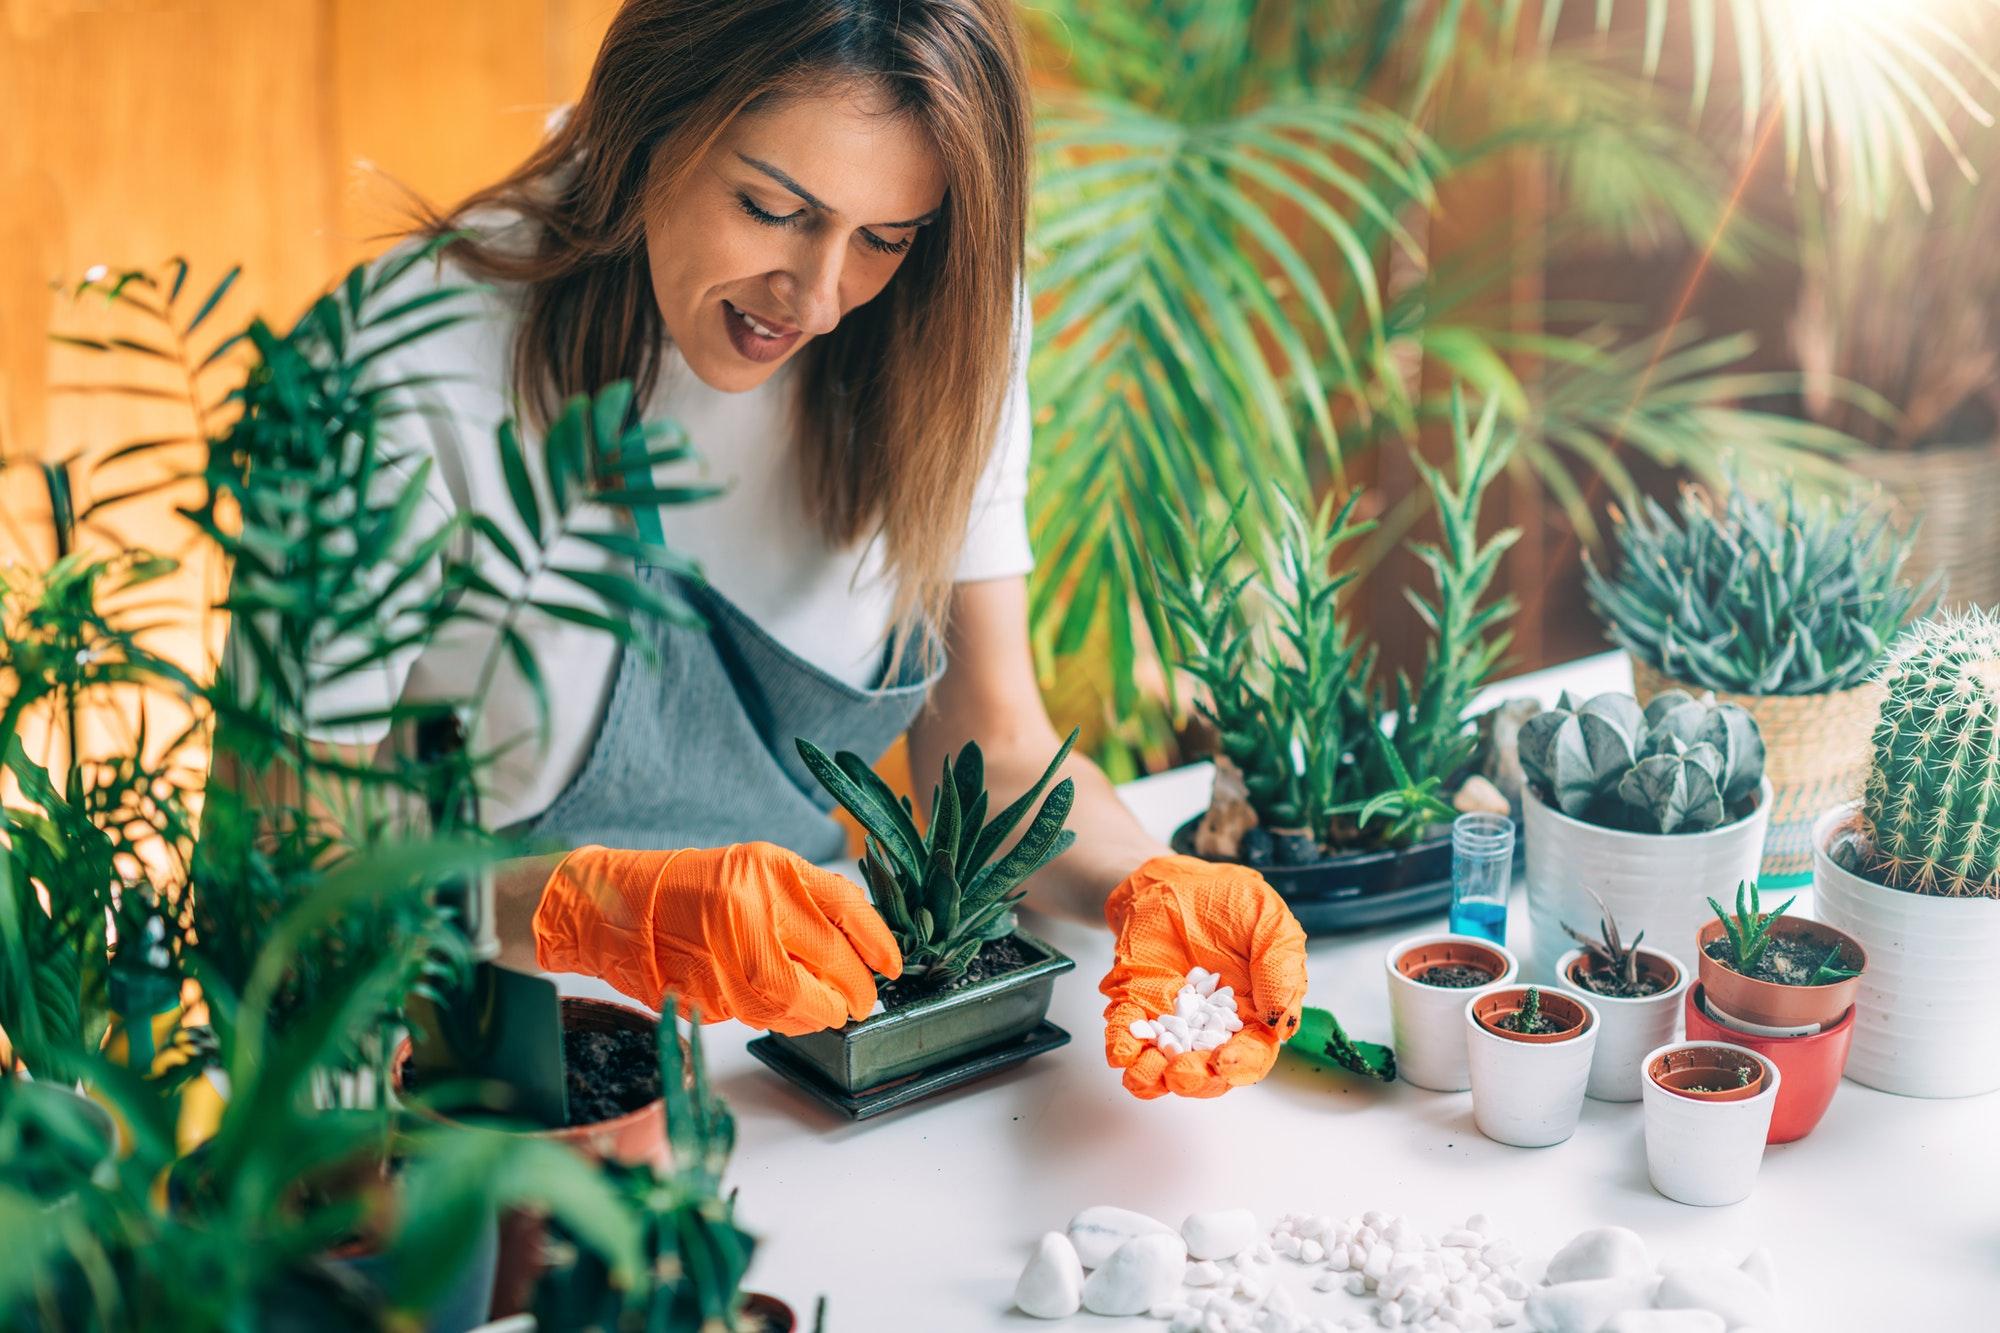 Indoor Gardening, Starting a Home Garden